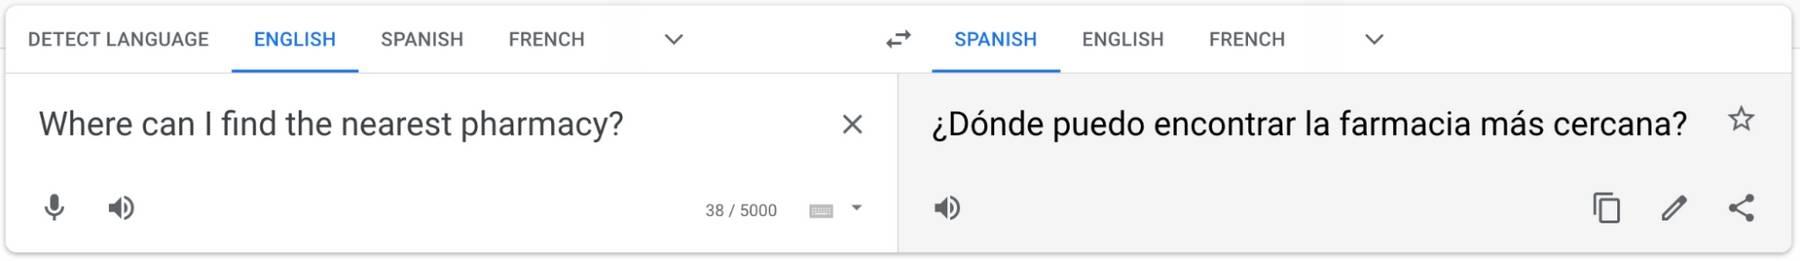 A English to Spanish Google translation of 'Where can I find the nearest pharmacy?' to '¿Dónde puedo encontrar la farmacia más cercana?'